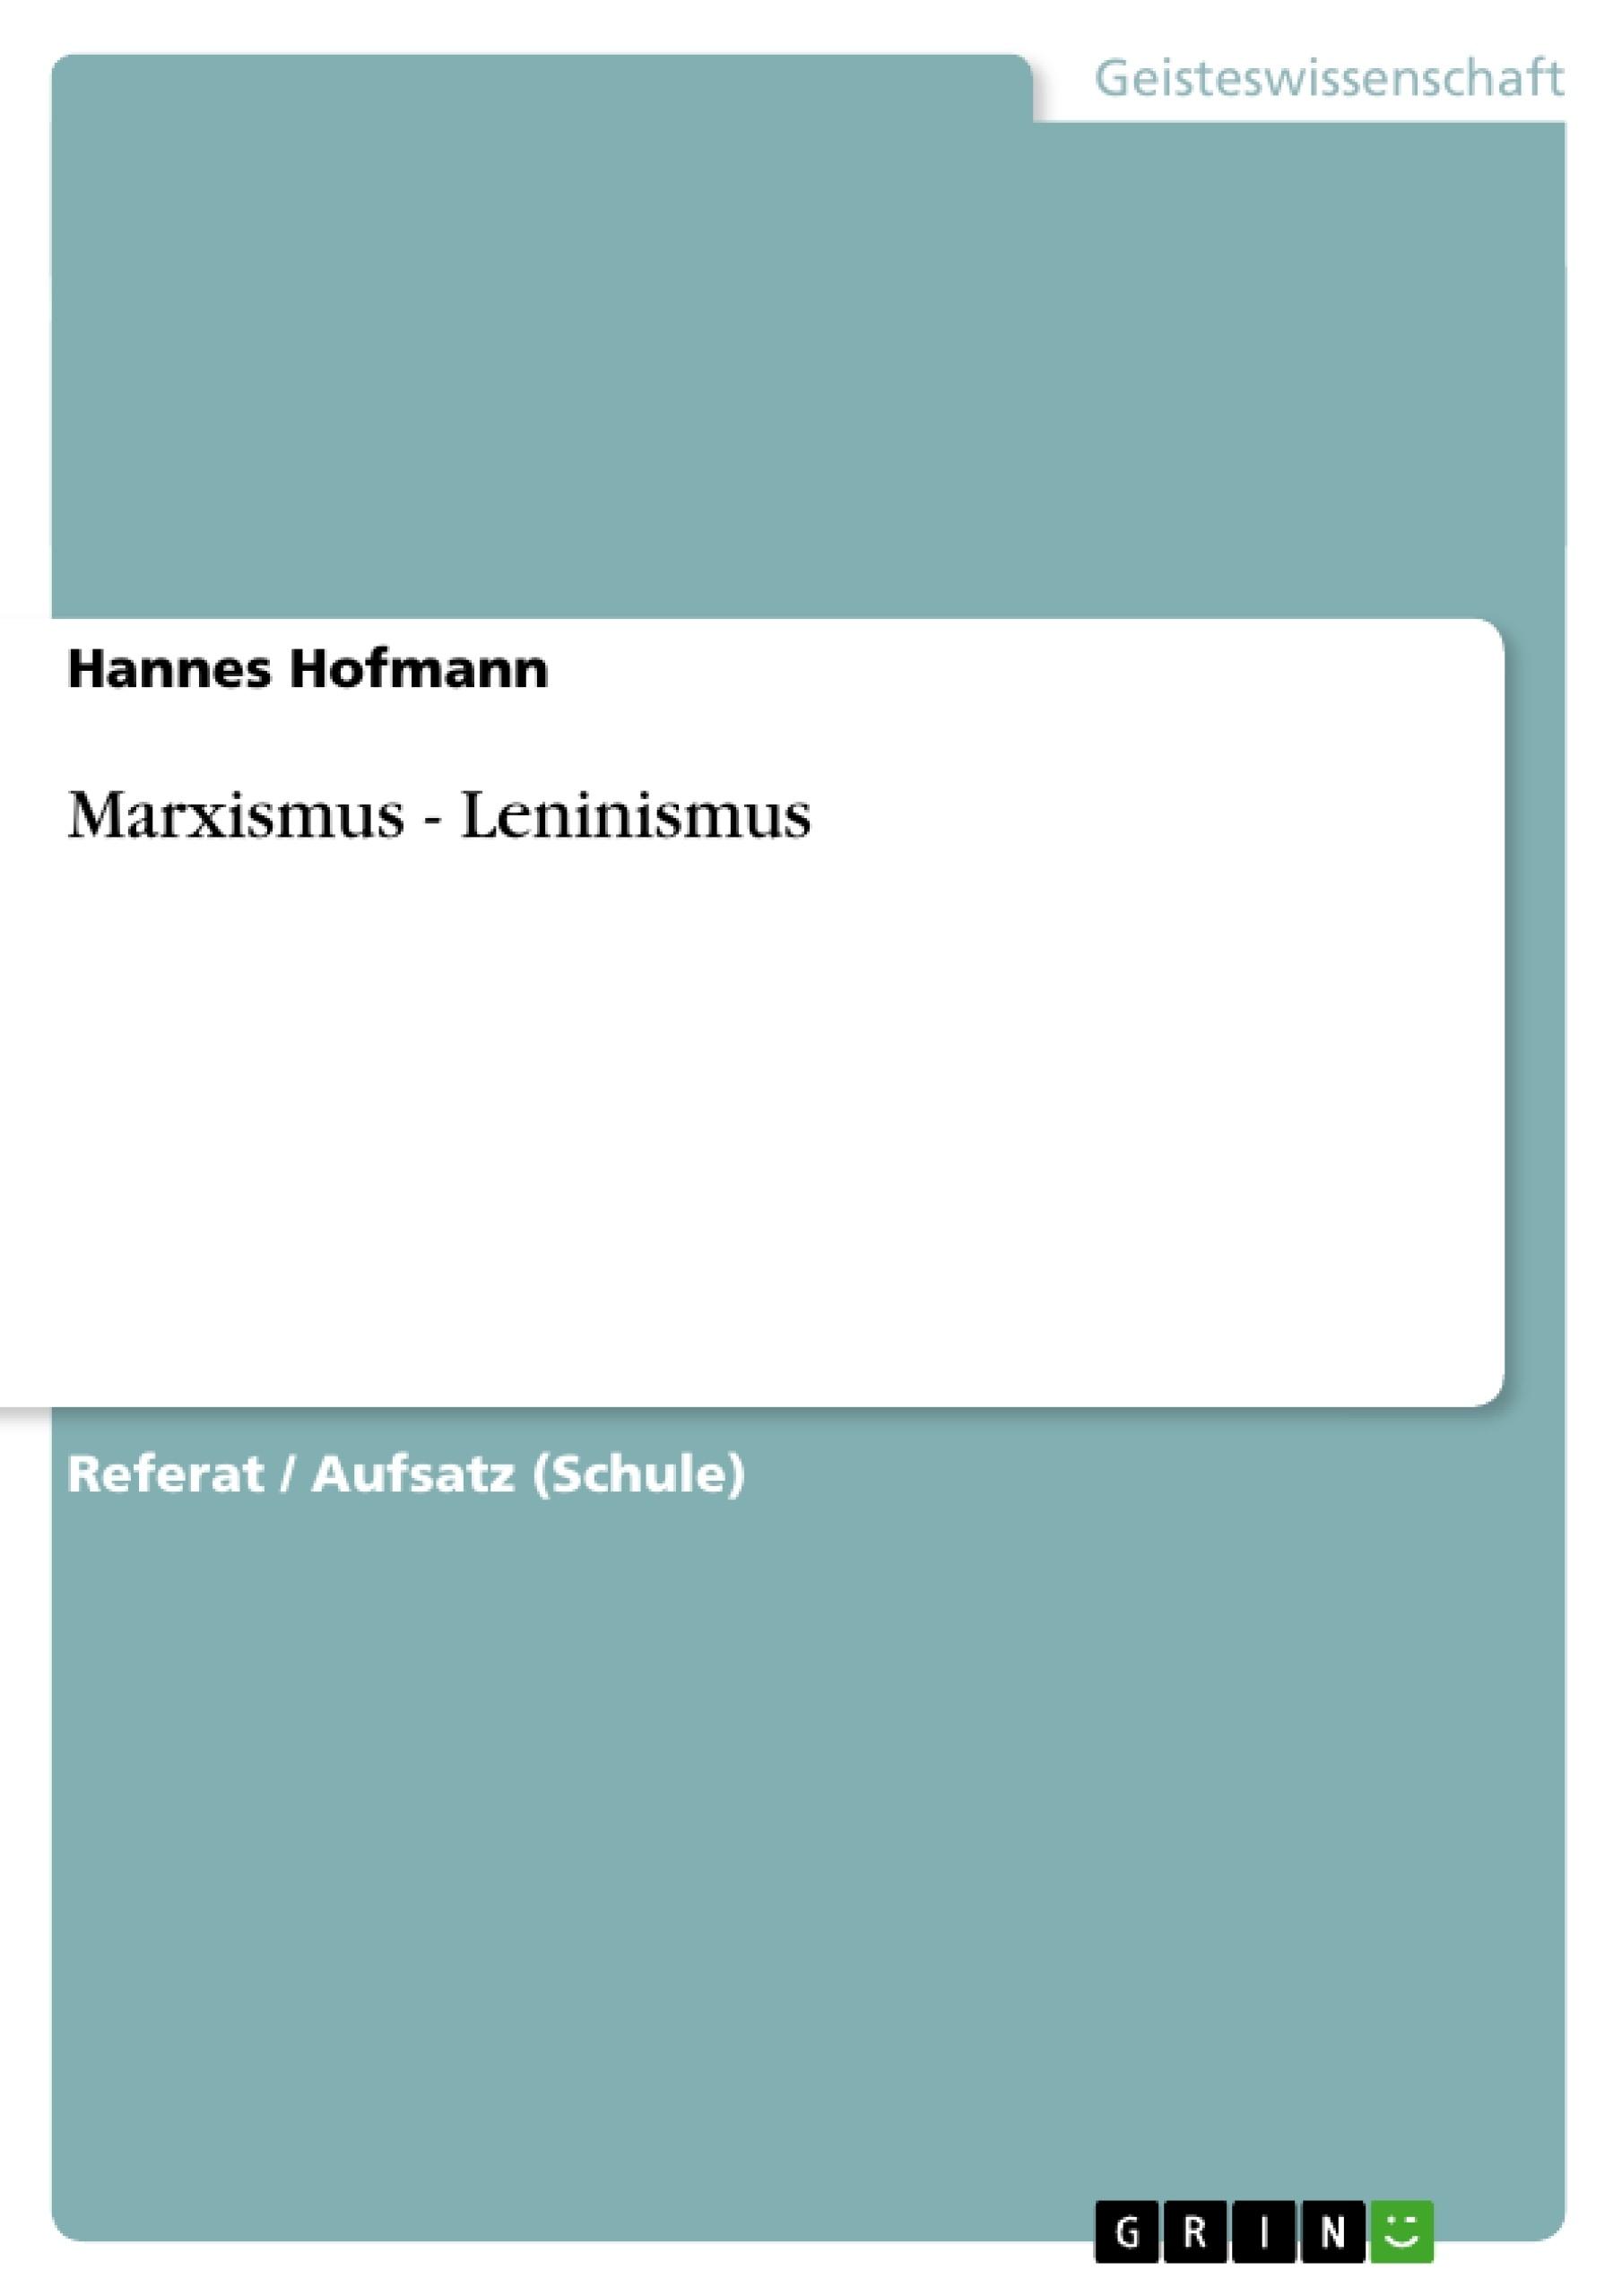 Titel: Marxismus - Leninismus